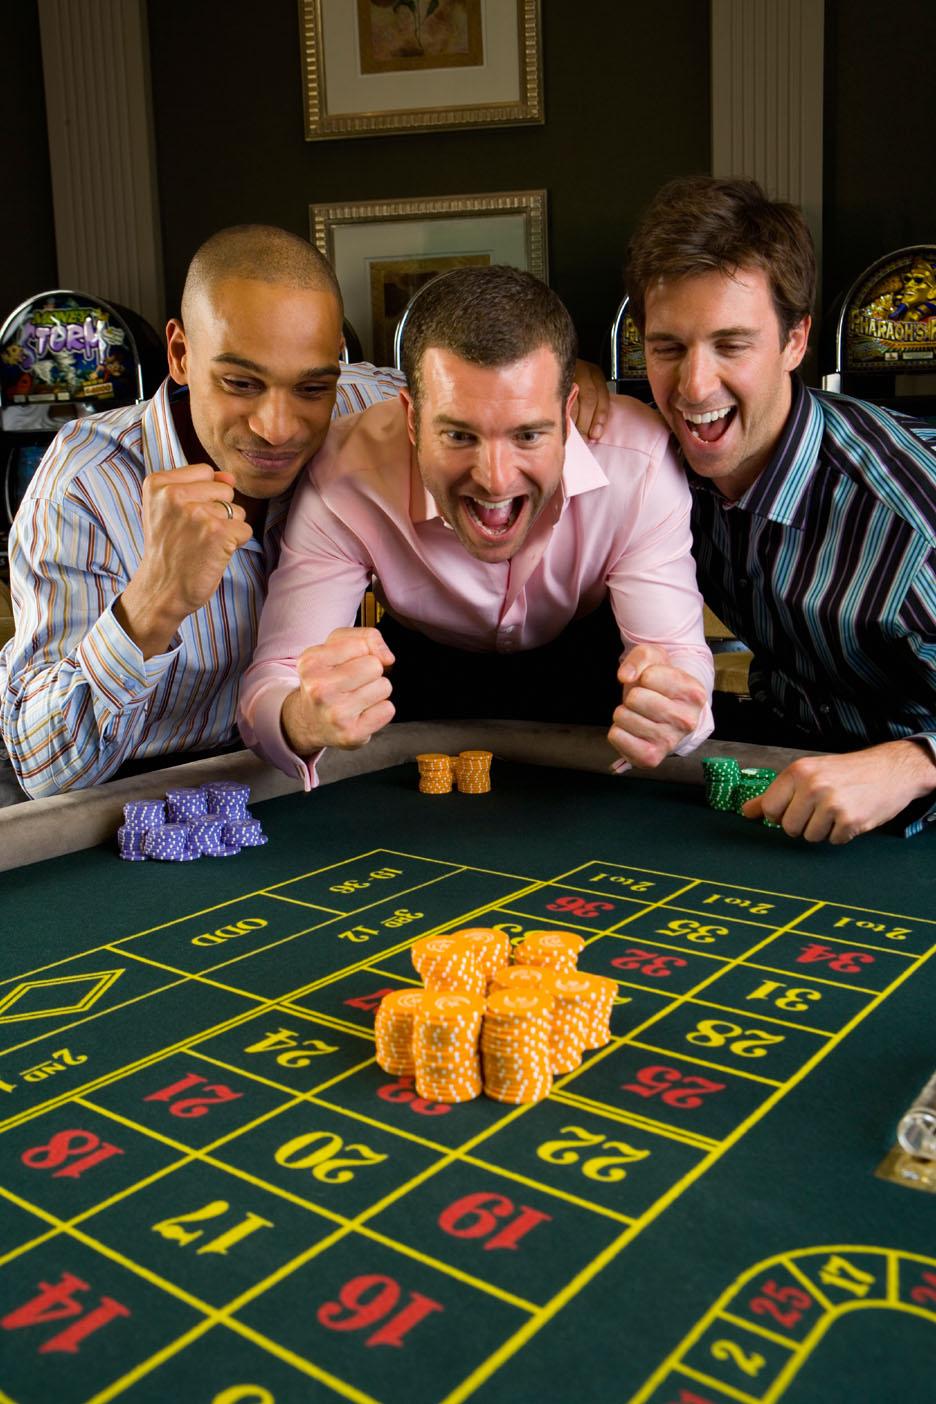 Win odds casino - 39441